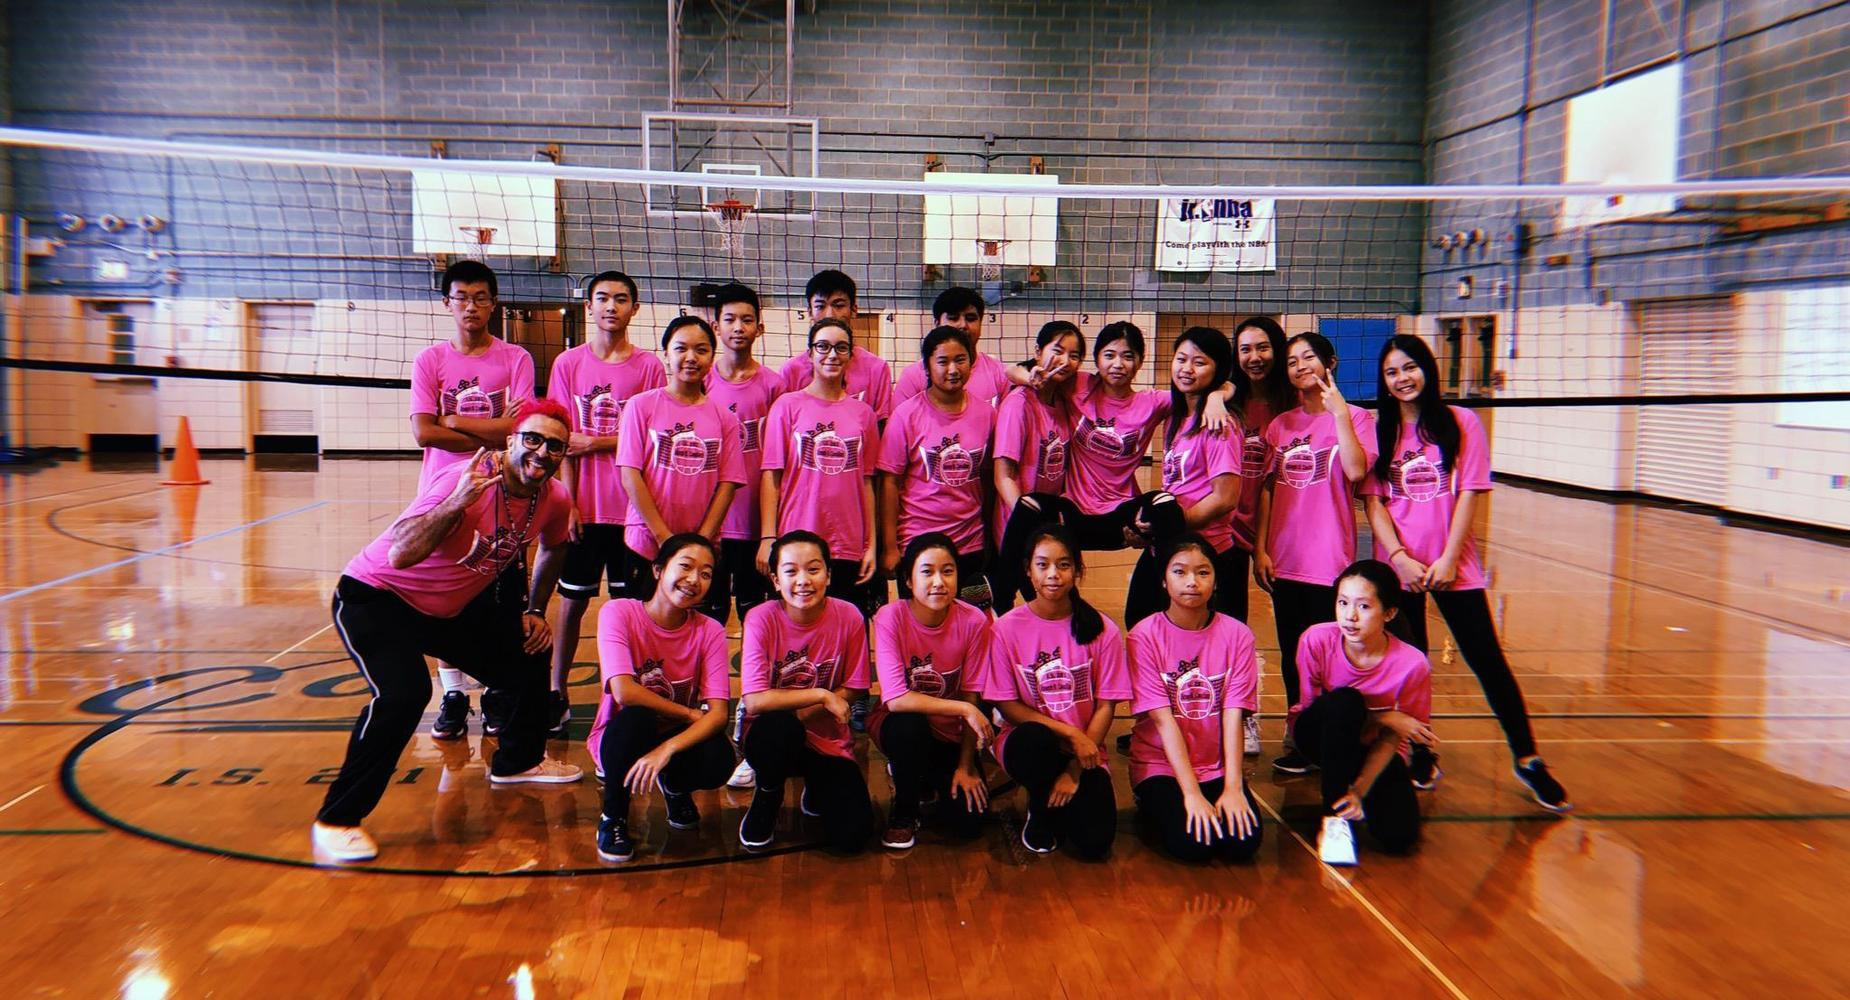 I.S. 281 Joseph B. Cavallaro - Volleyball Team